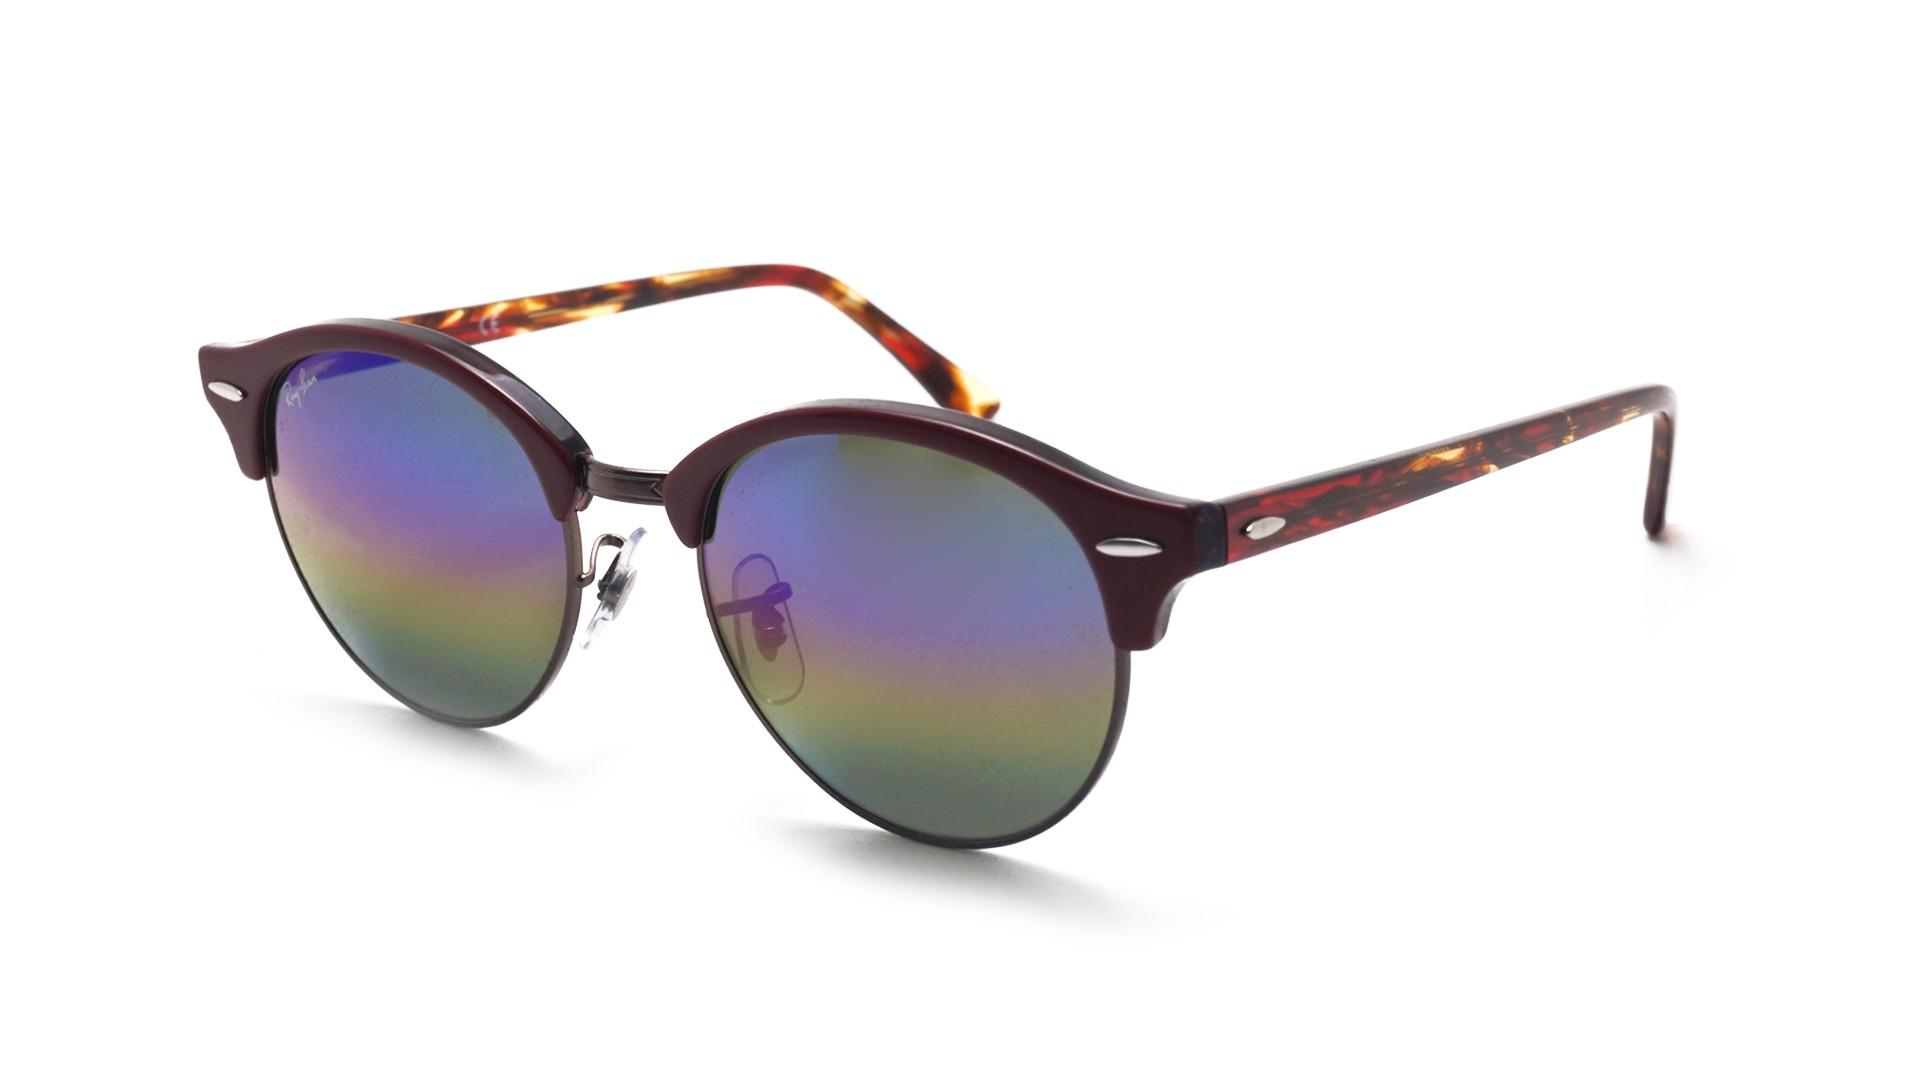 809590b69d Sunglasses Ray-Ban Clubround Purple RB4246 1221C3 51-19 Medium Gradient  Mirror